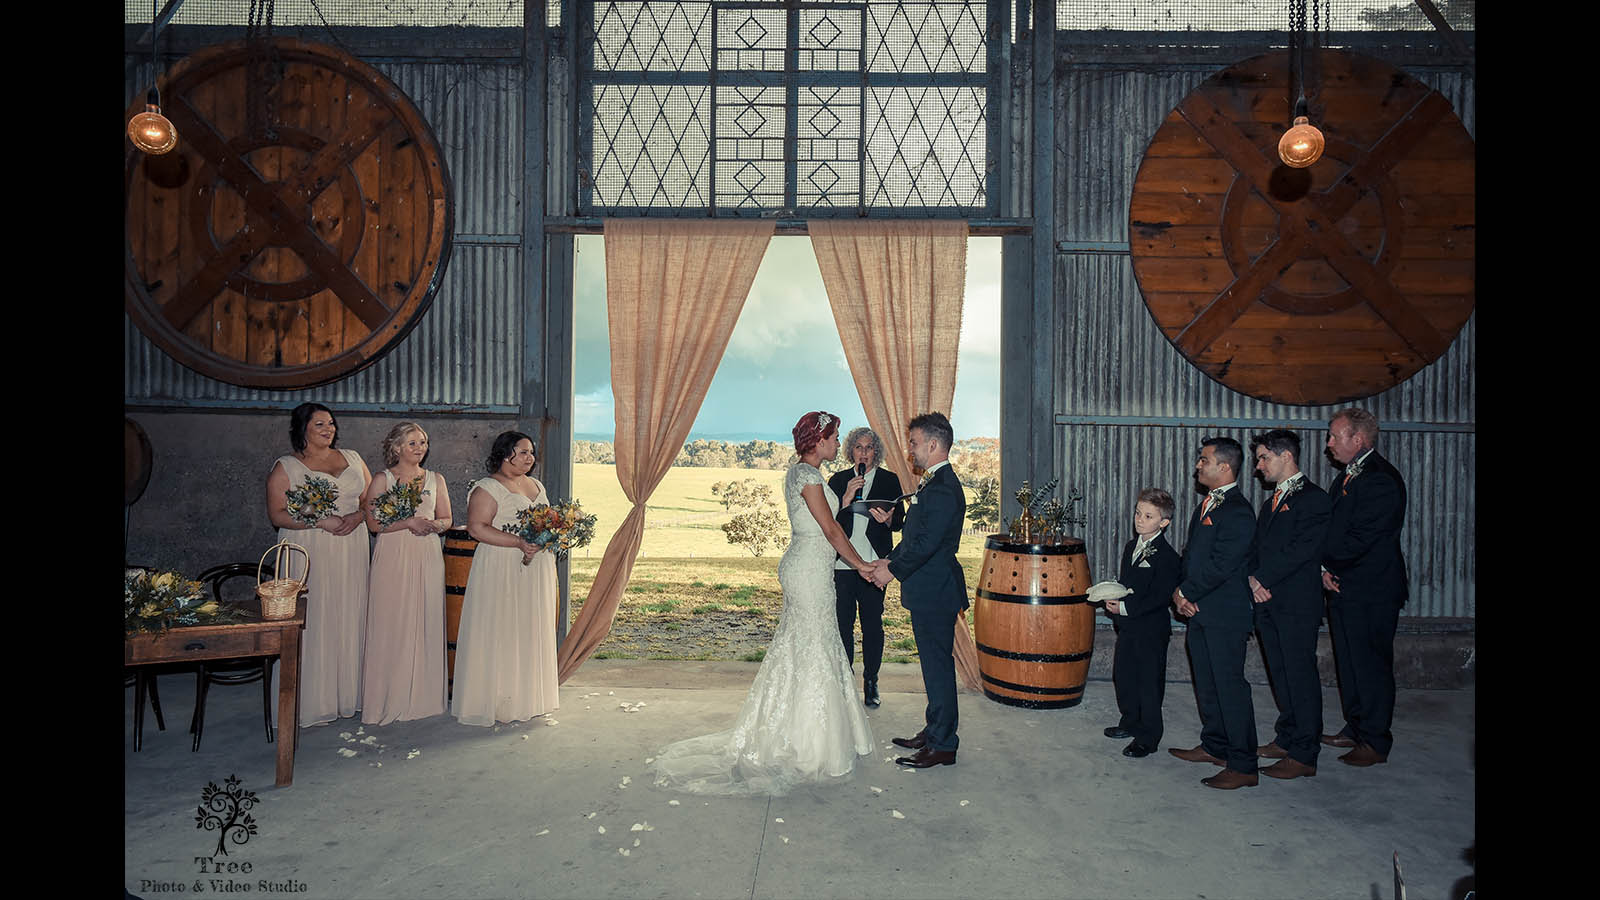 Zonzo Wedding Ceremony Photography